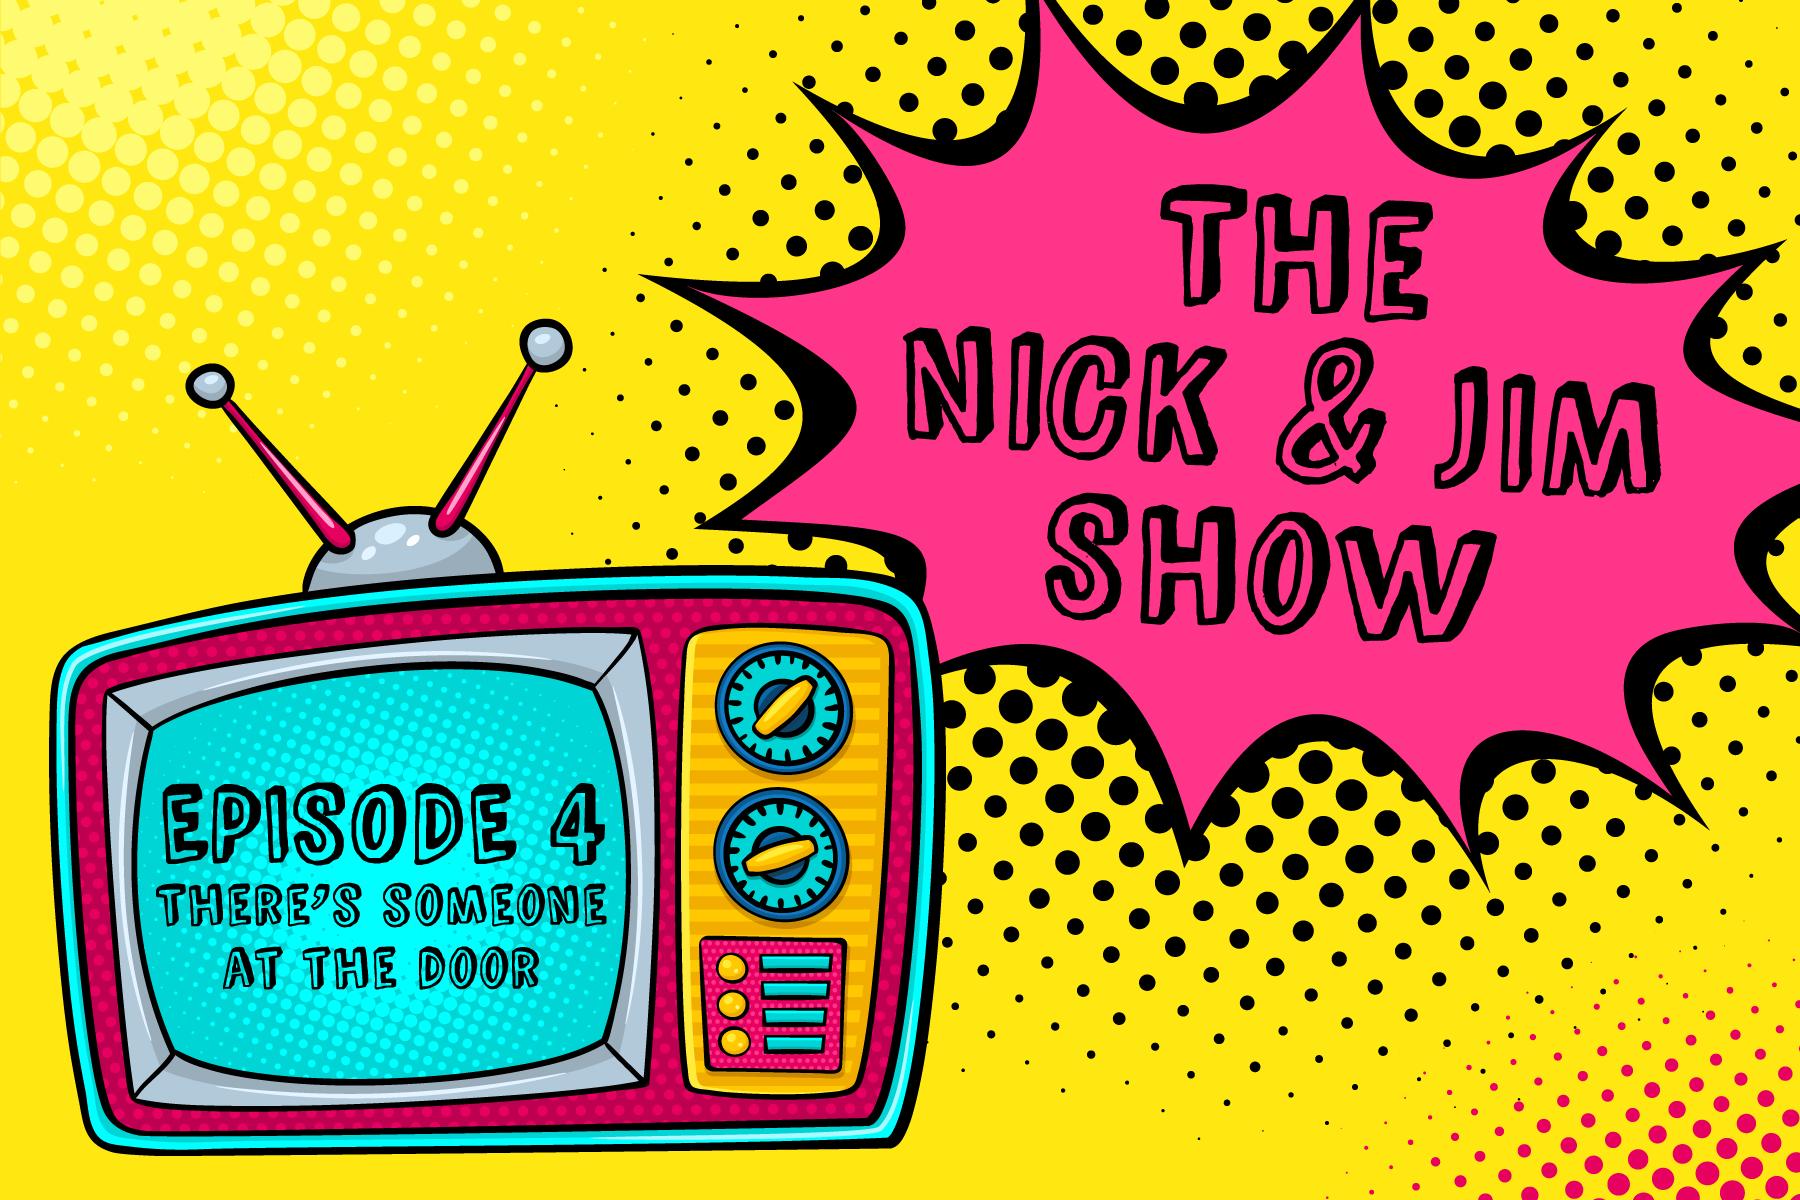 The-Nick-and-Jim-Show-ep4